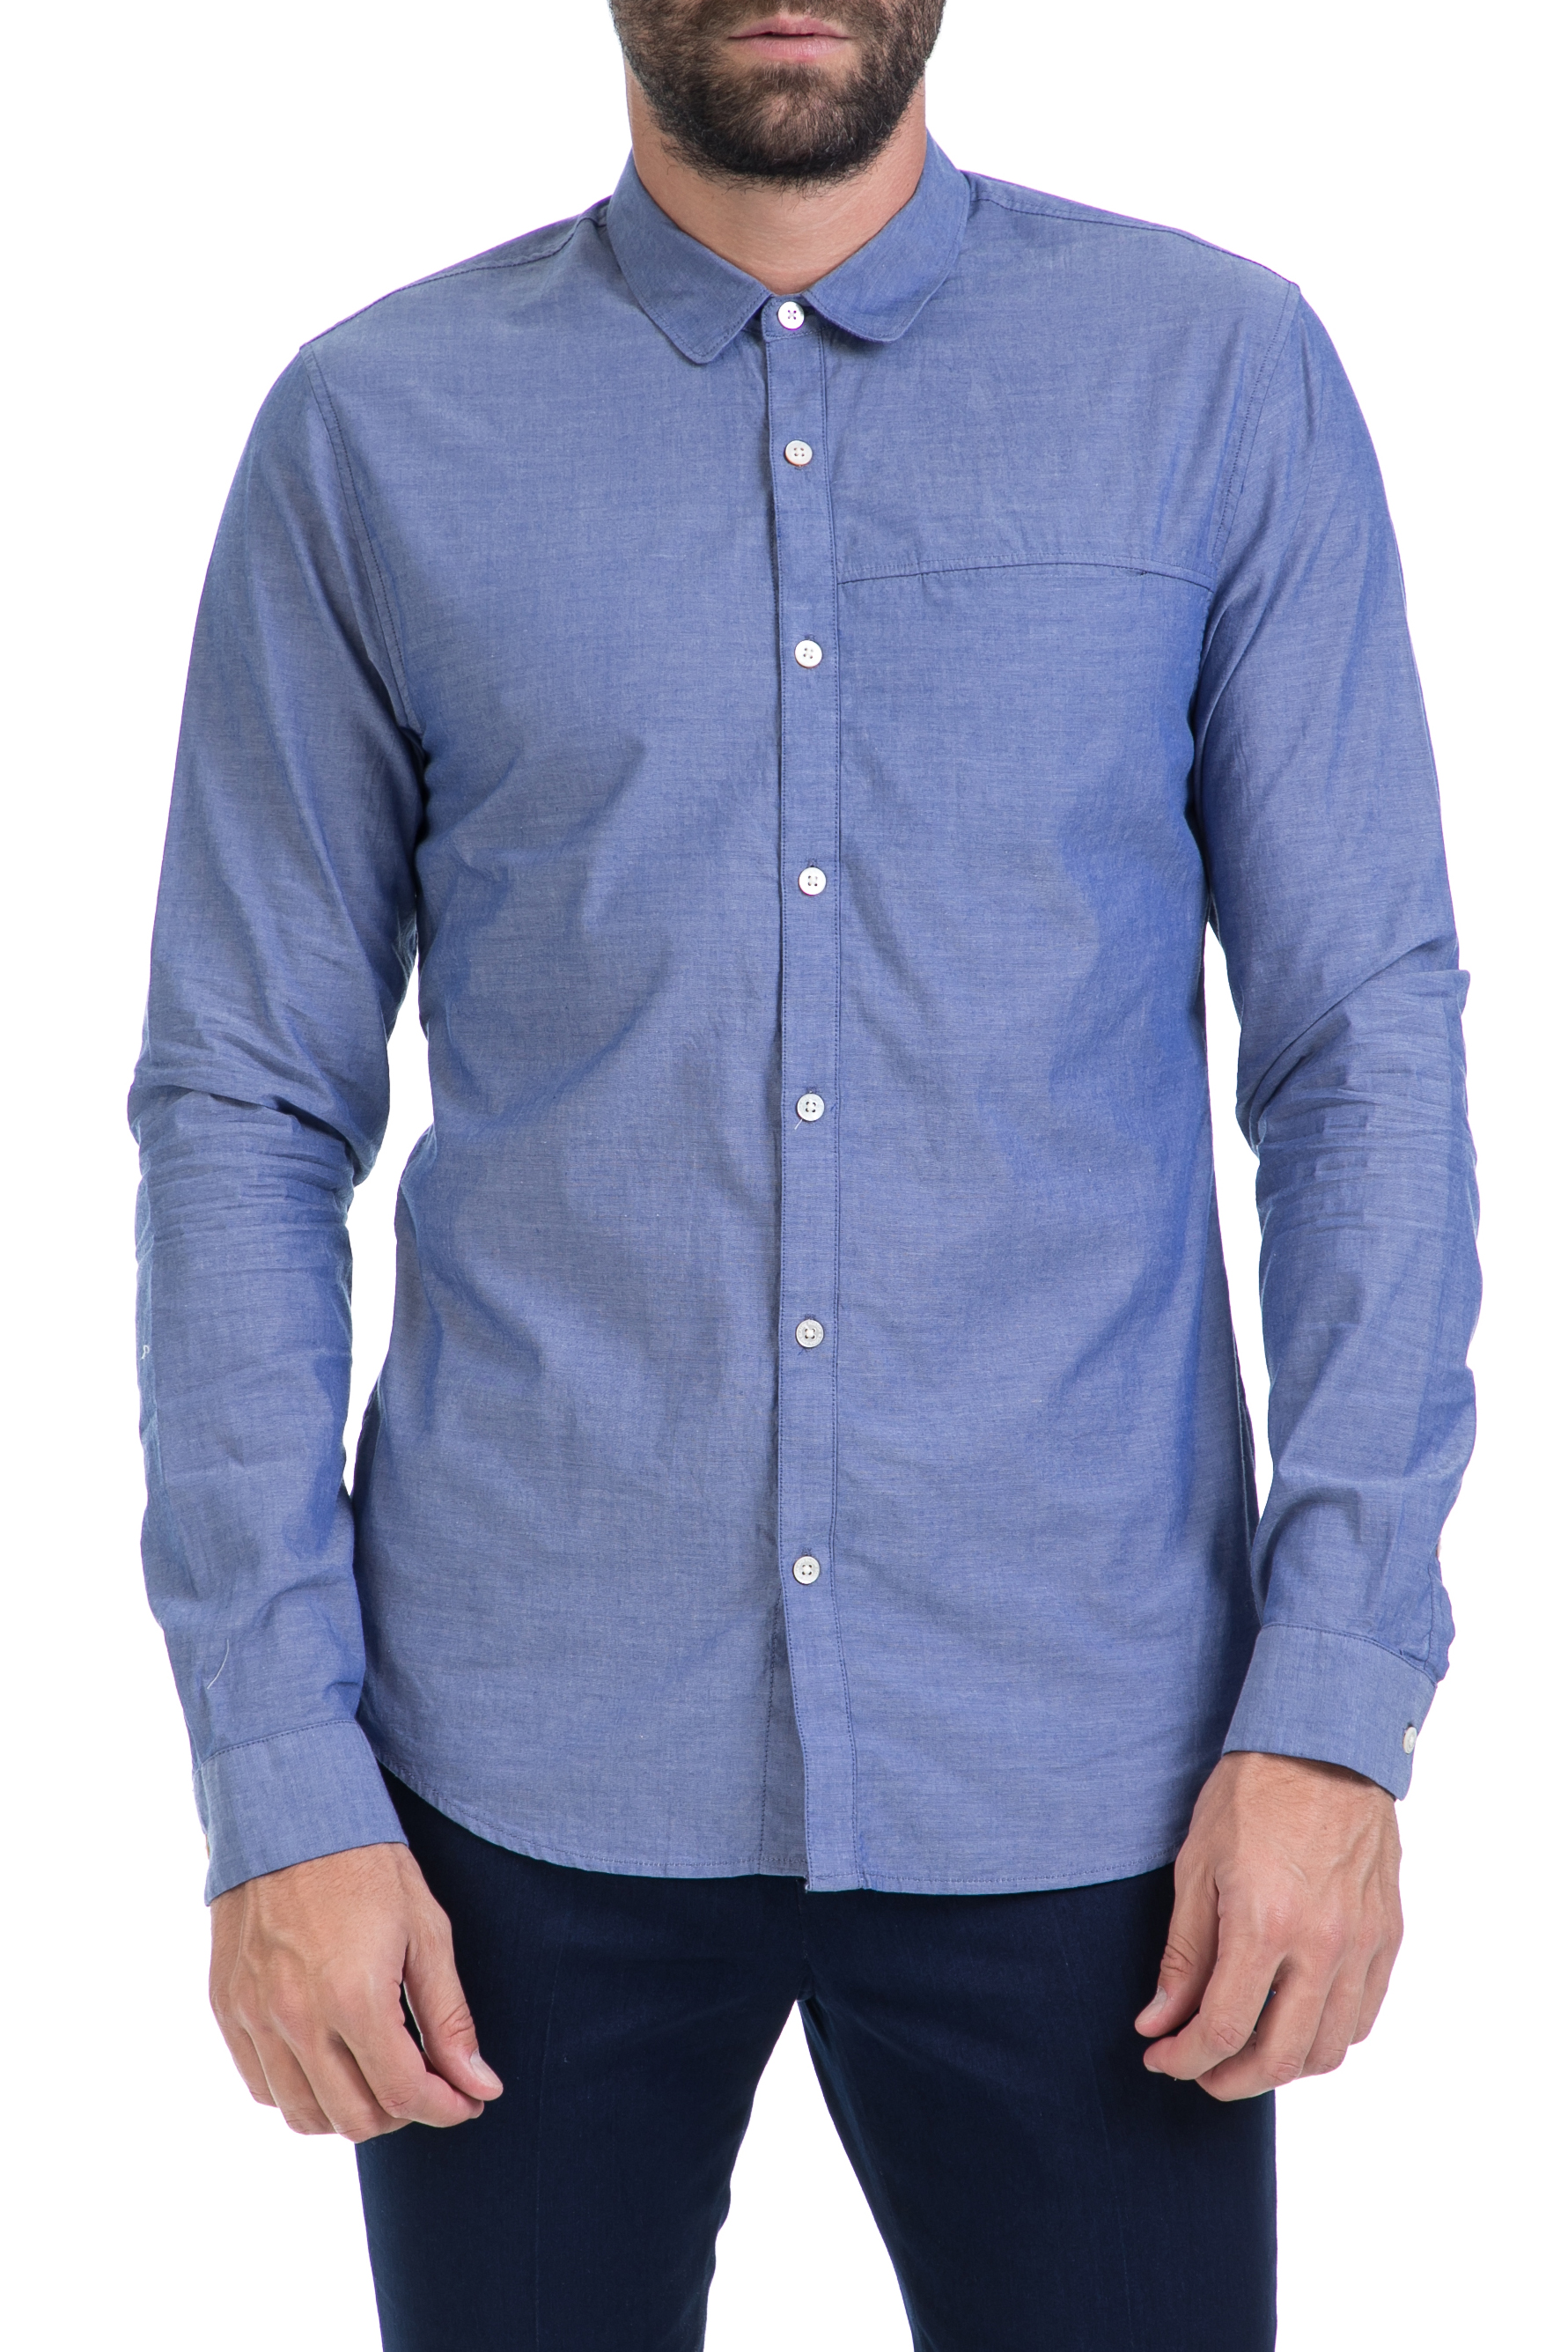 SCOTCH & SODA - Ανδρικό πουκάμισο Clean and crispy hotel shirt μπλε ανδρικά ρούχα πουκάμισα μακρυμάνικα